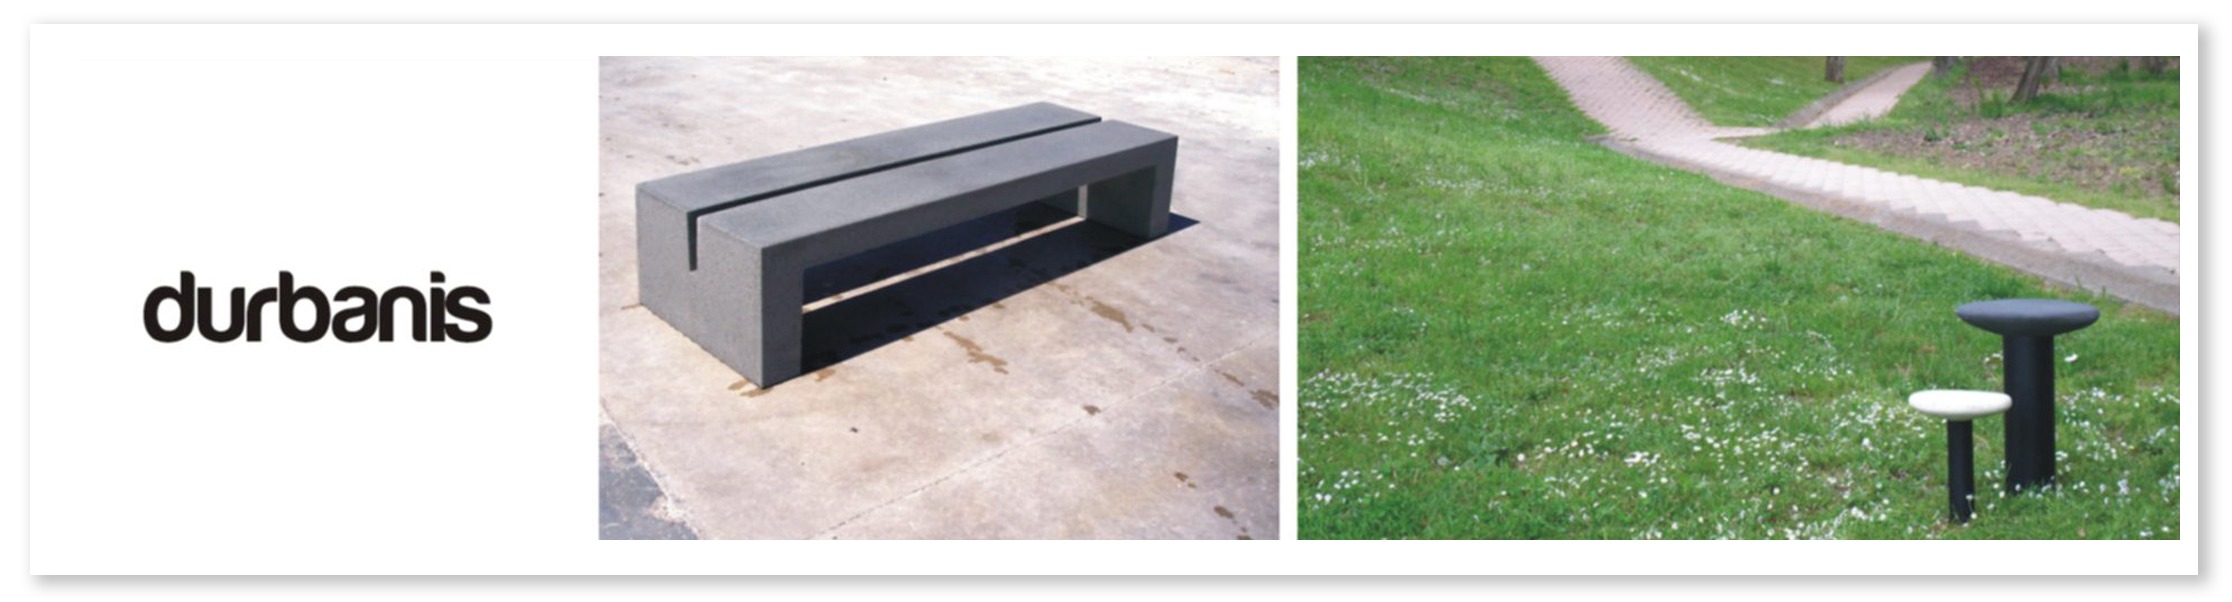 Urban furniture paisea for Urban furniture